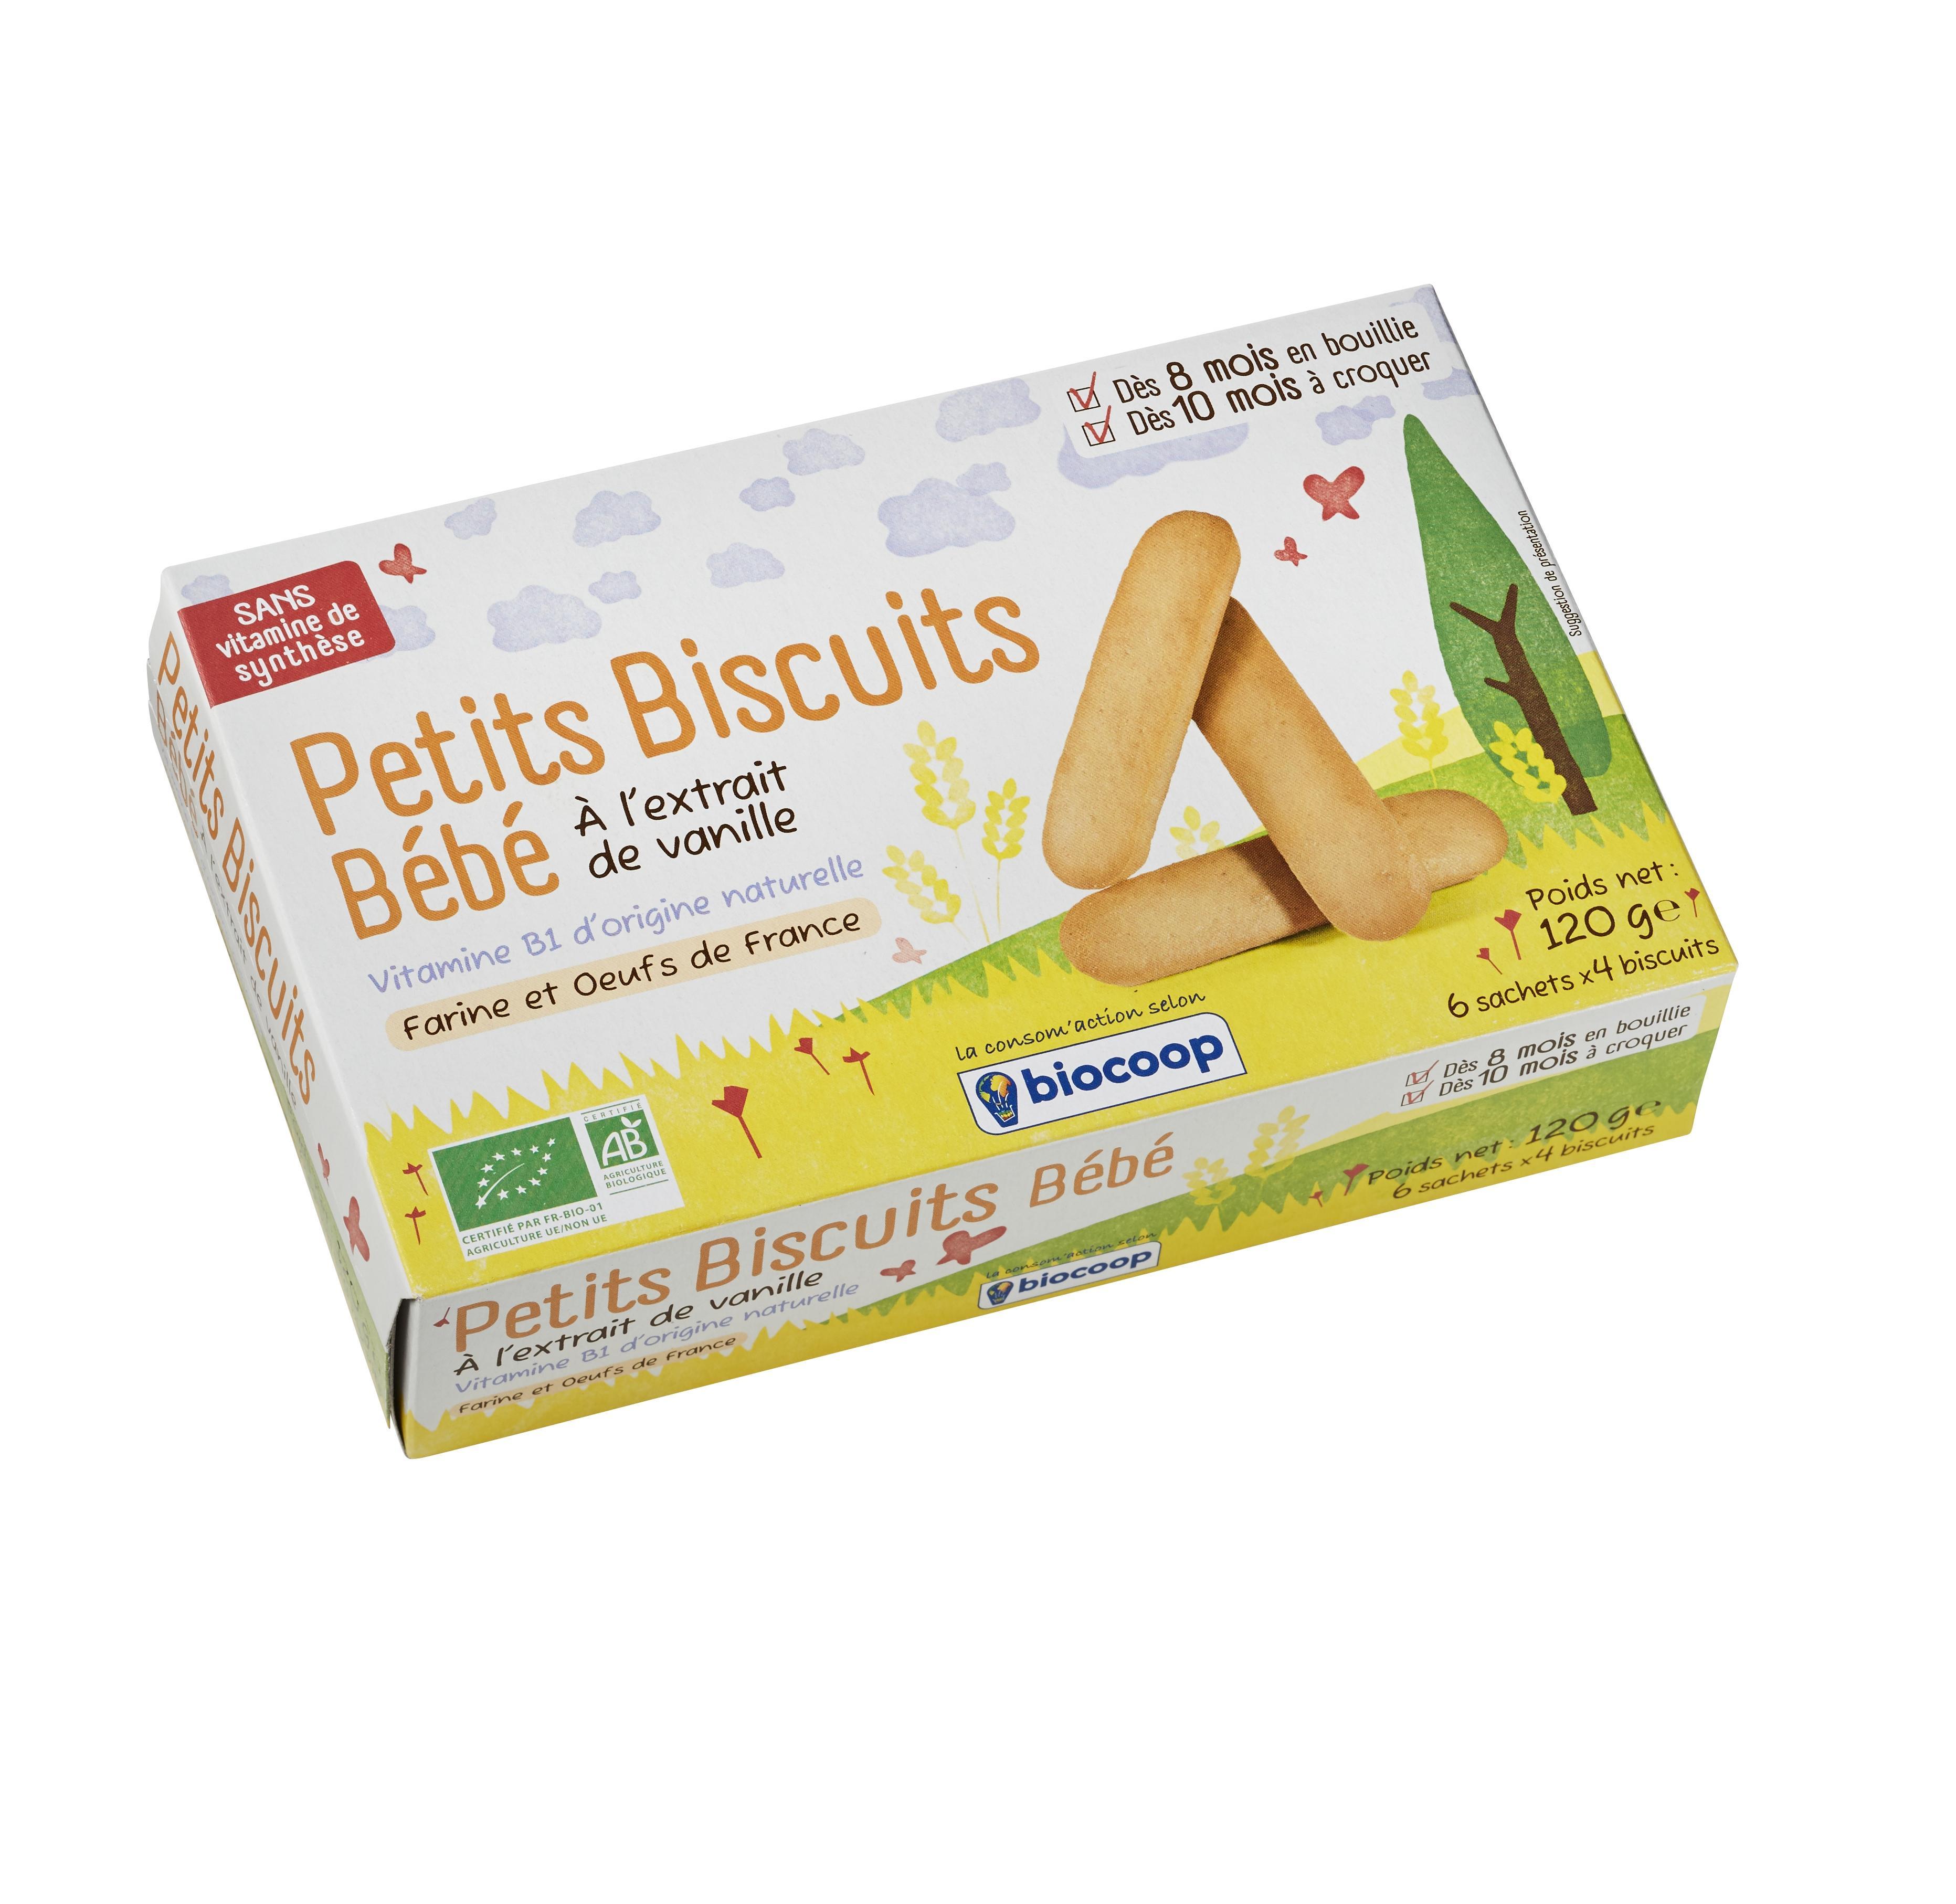 biocoop innove avec ses petits biscuits b b bio la vitamine b1 naturelle valenciennes. Black Bedroom Furniture Sets. Home Design Ideas